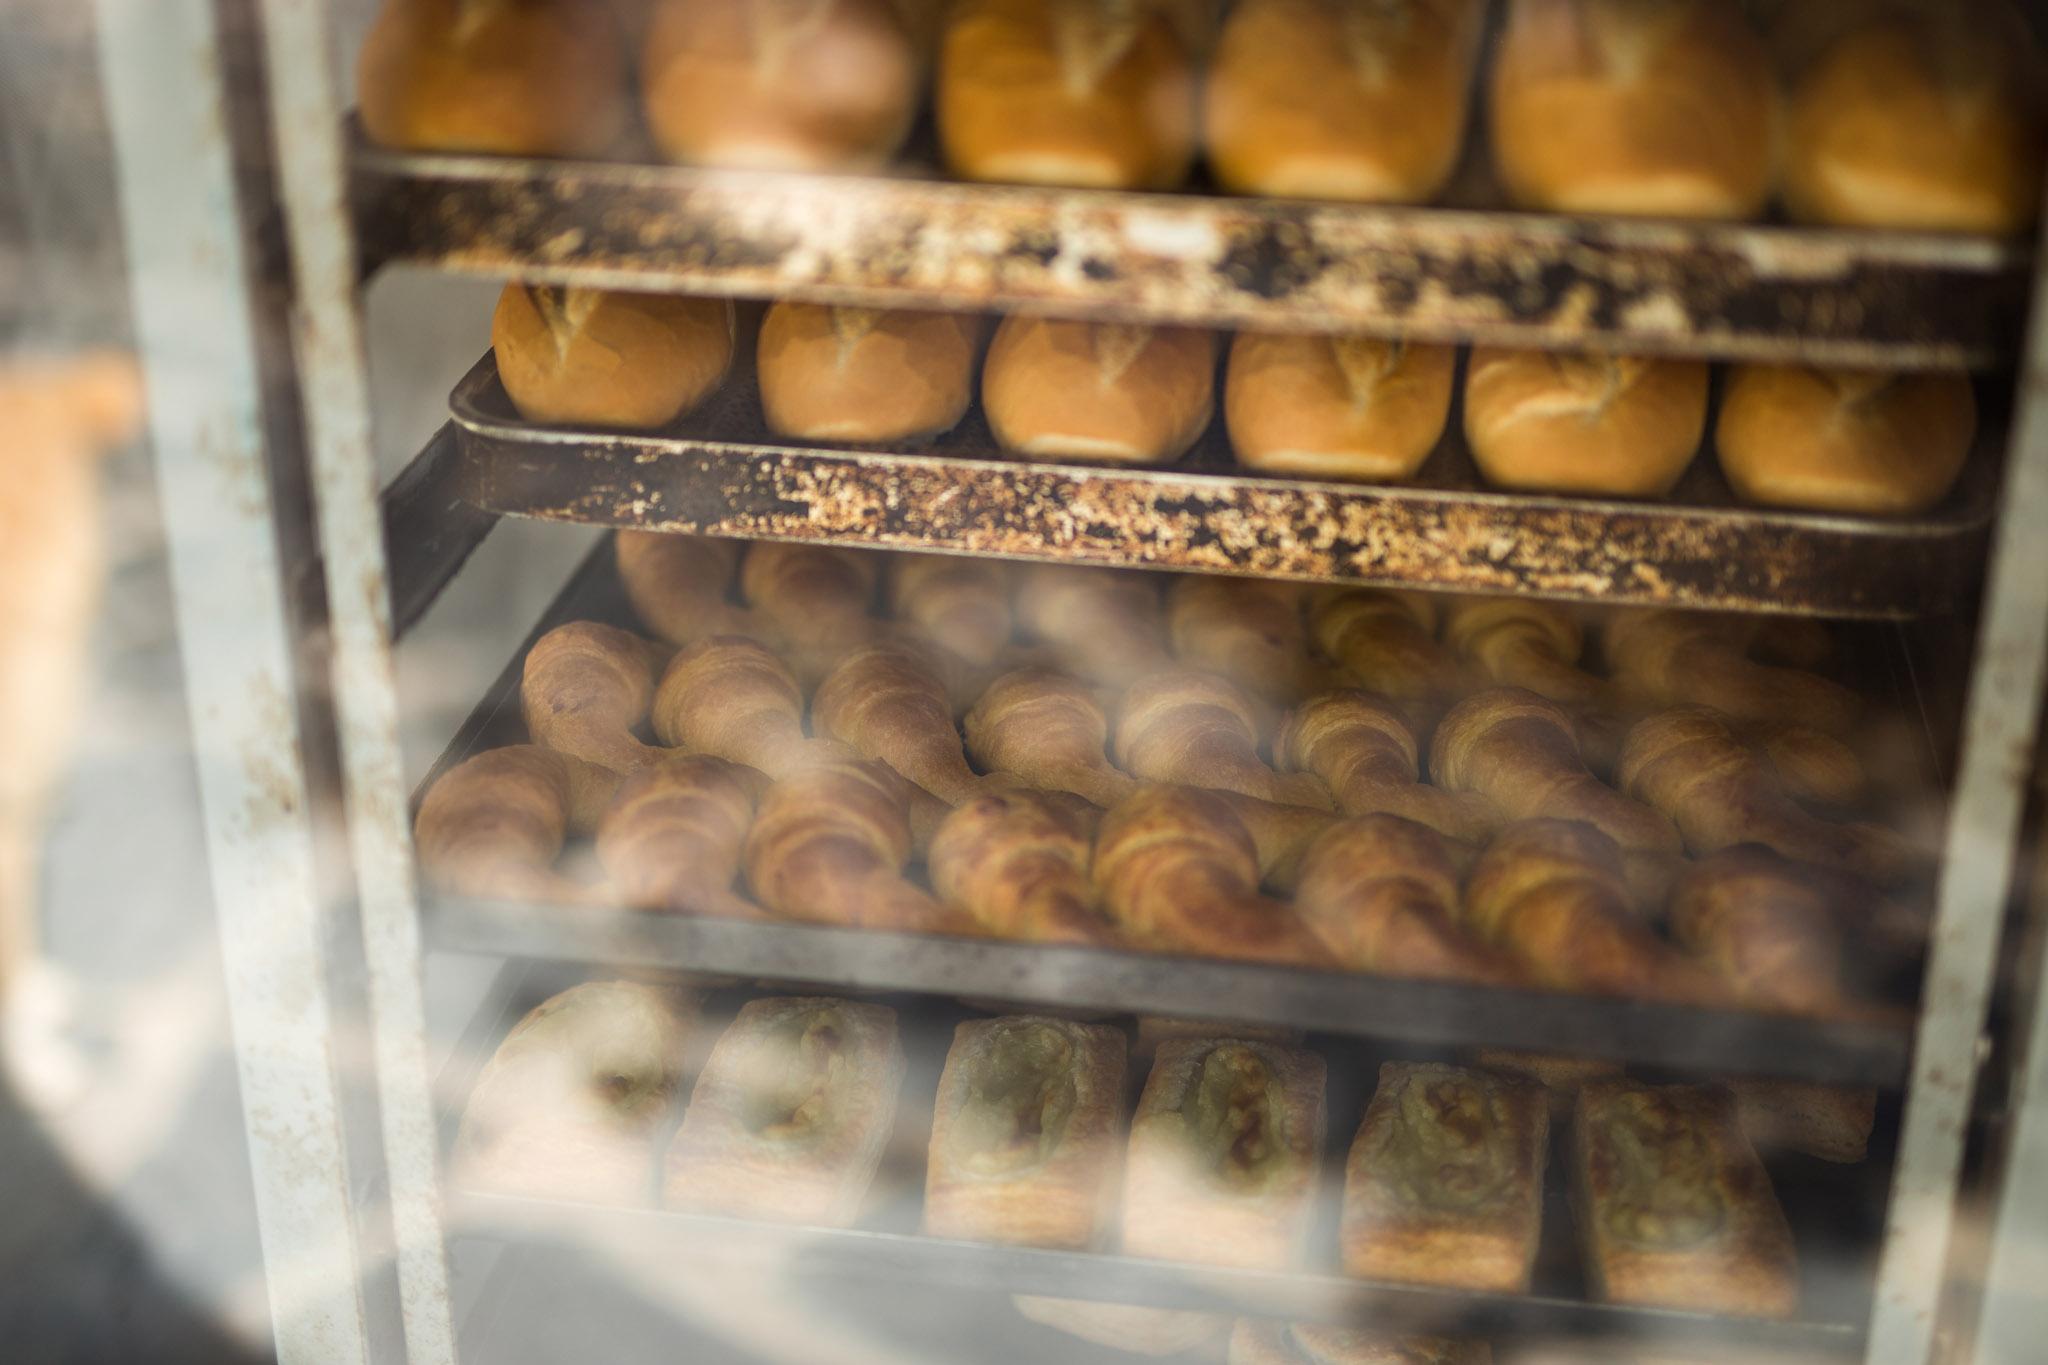 wedding-travellers-argentina-gaiman-bakery-bread-fresh-croissant-window